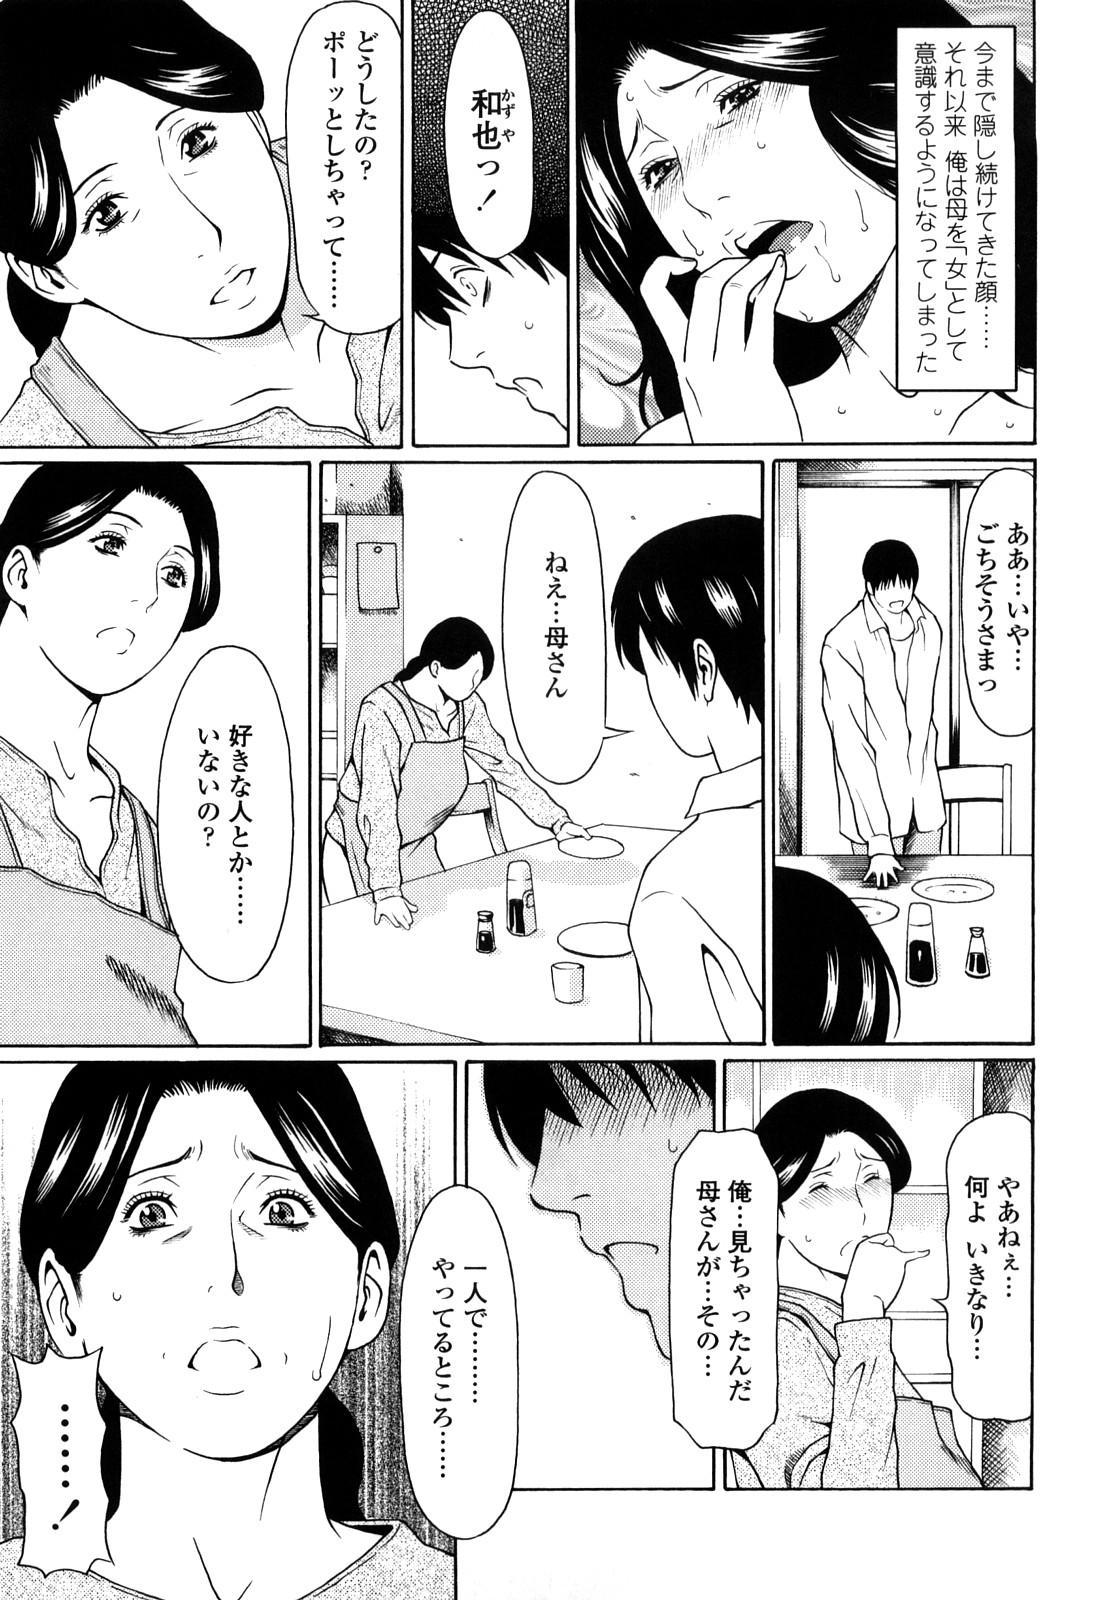 [Takasugi Kou] Kindan no Haha-Ana - Immorality Love-Hole [Decensored] 24